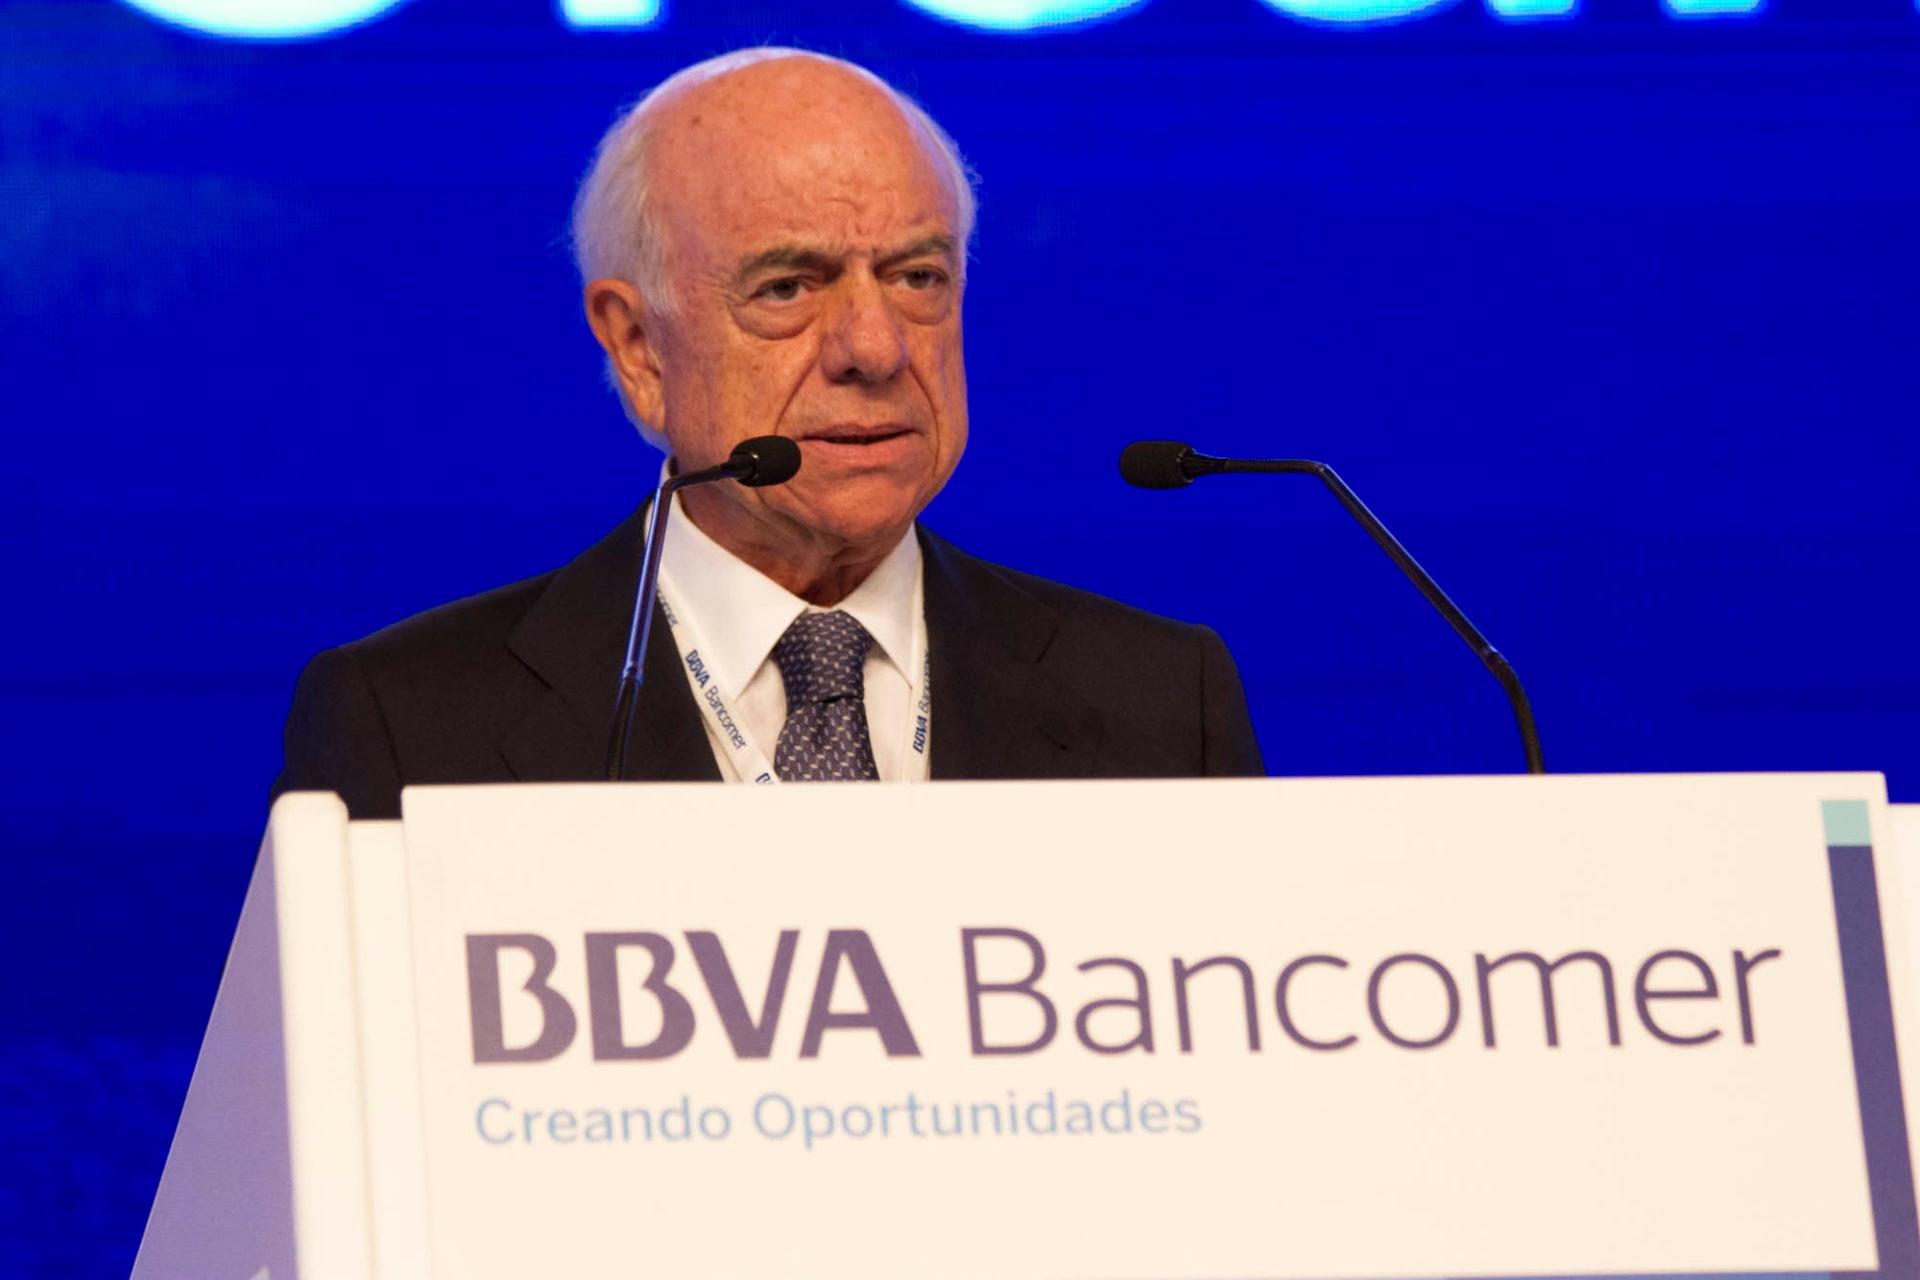 bbva_francisco-gonzalez_-consejo-bbva-bancomer_-2